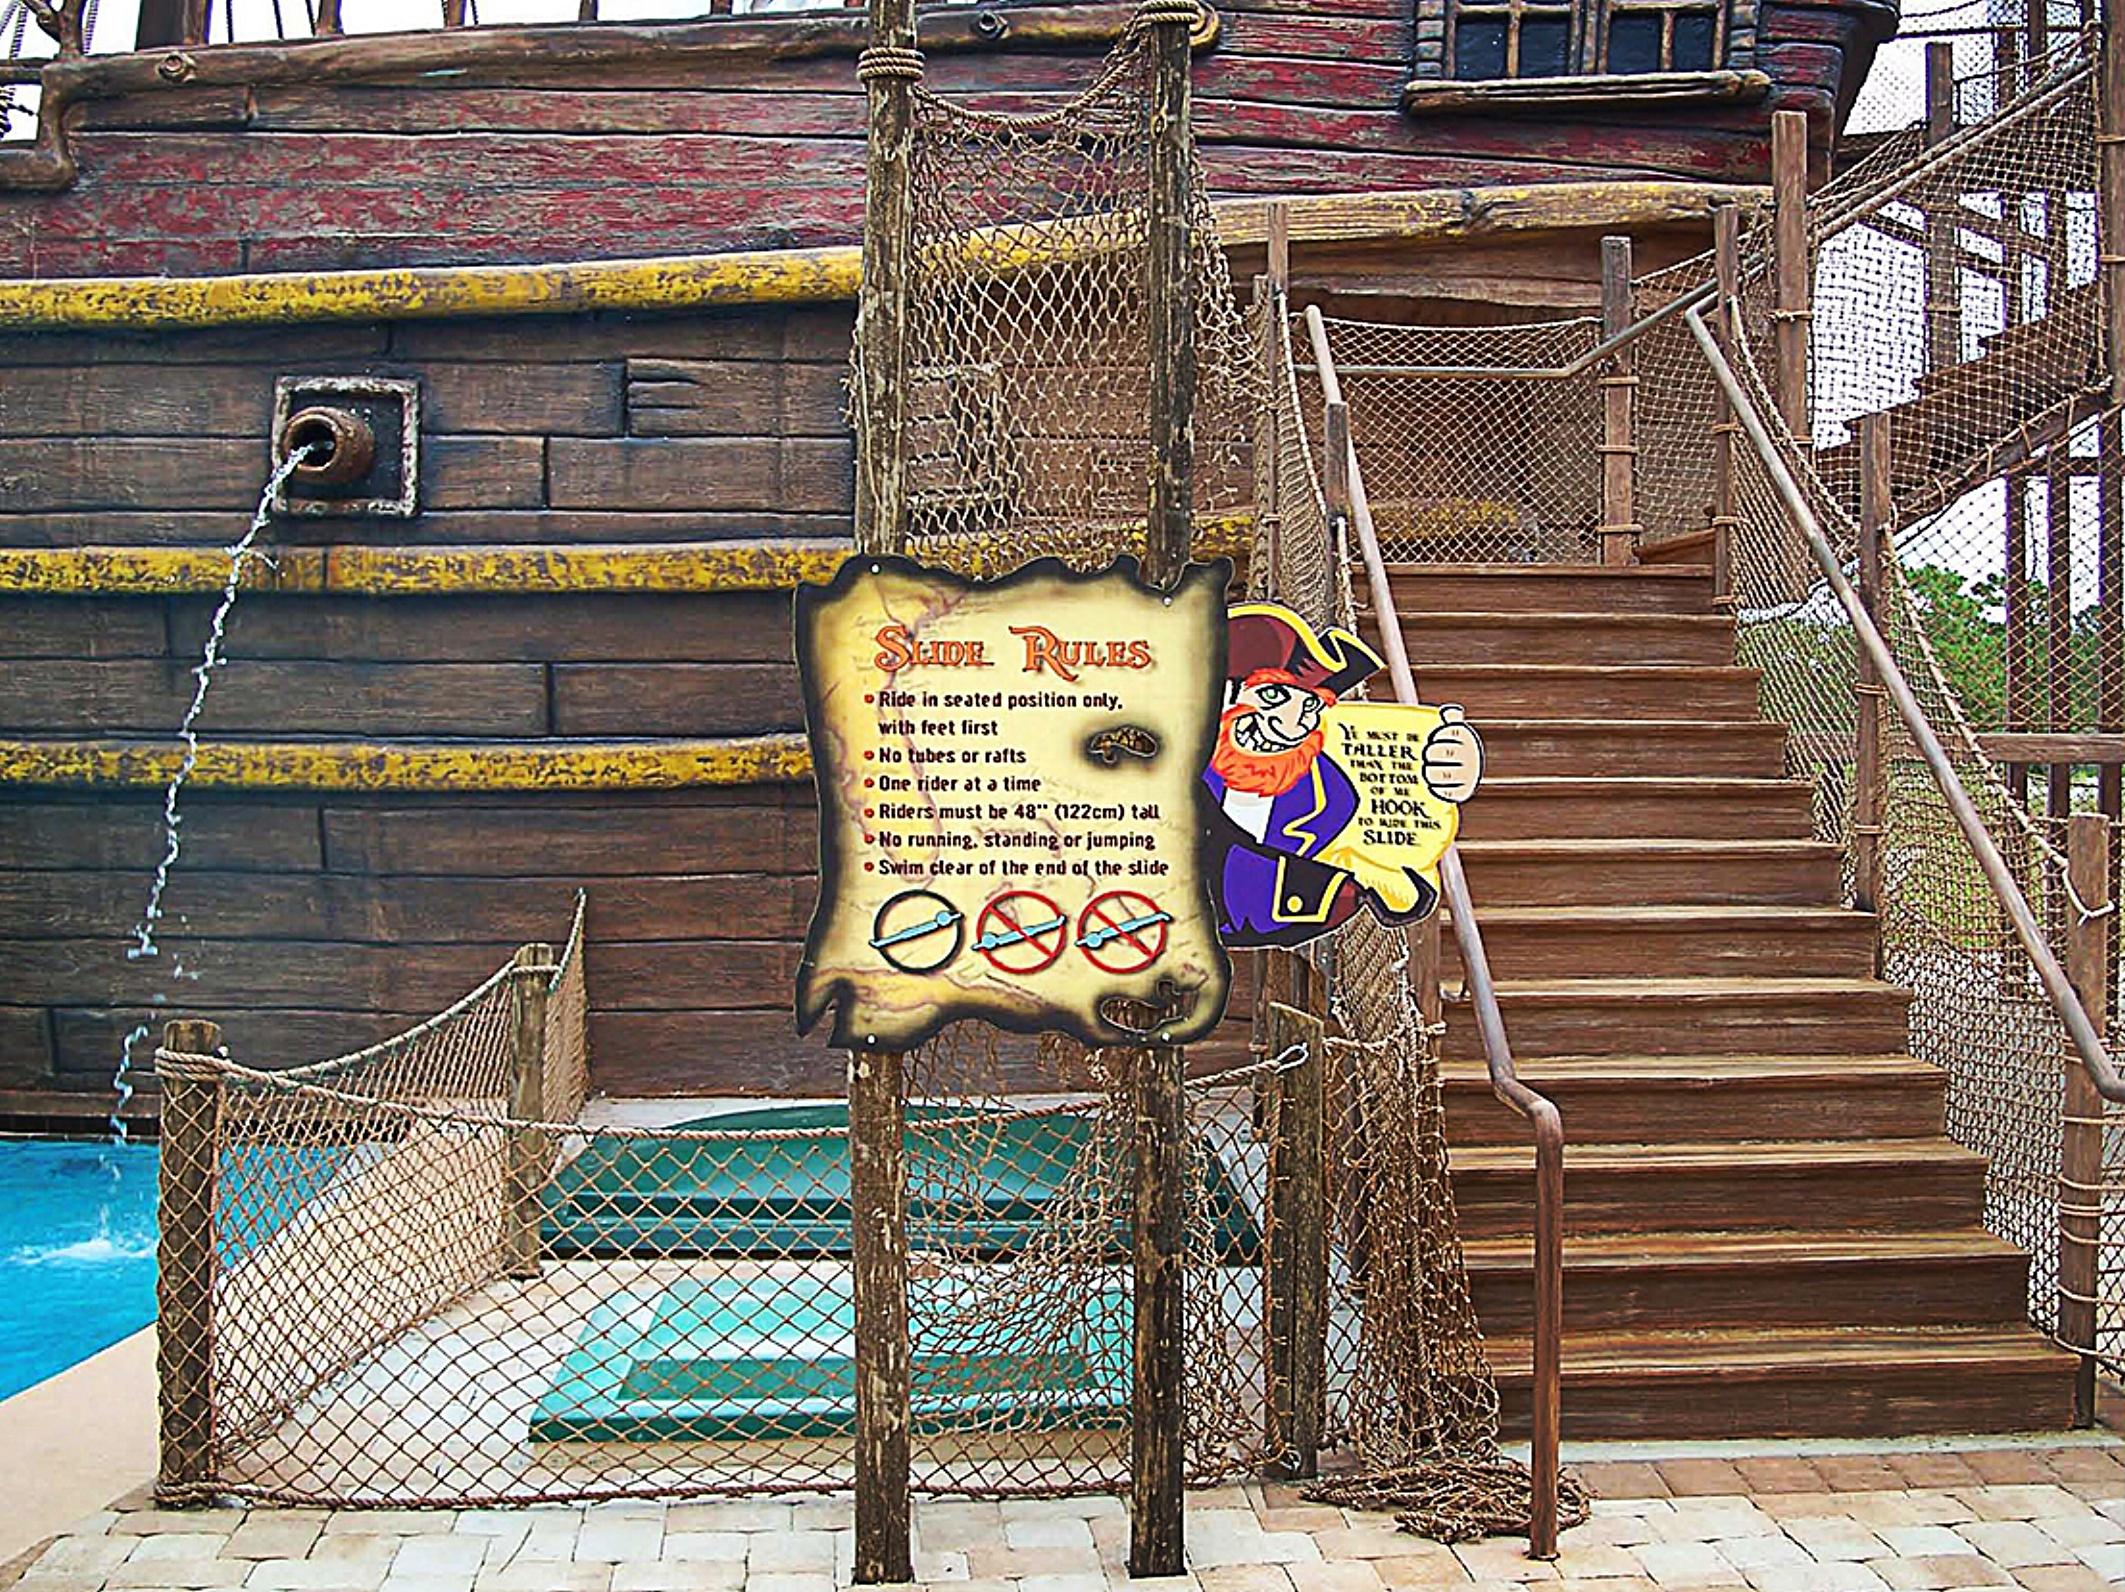 fl-te-pirates plunge 09.jpg